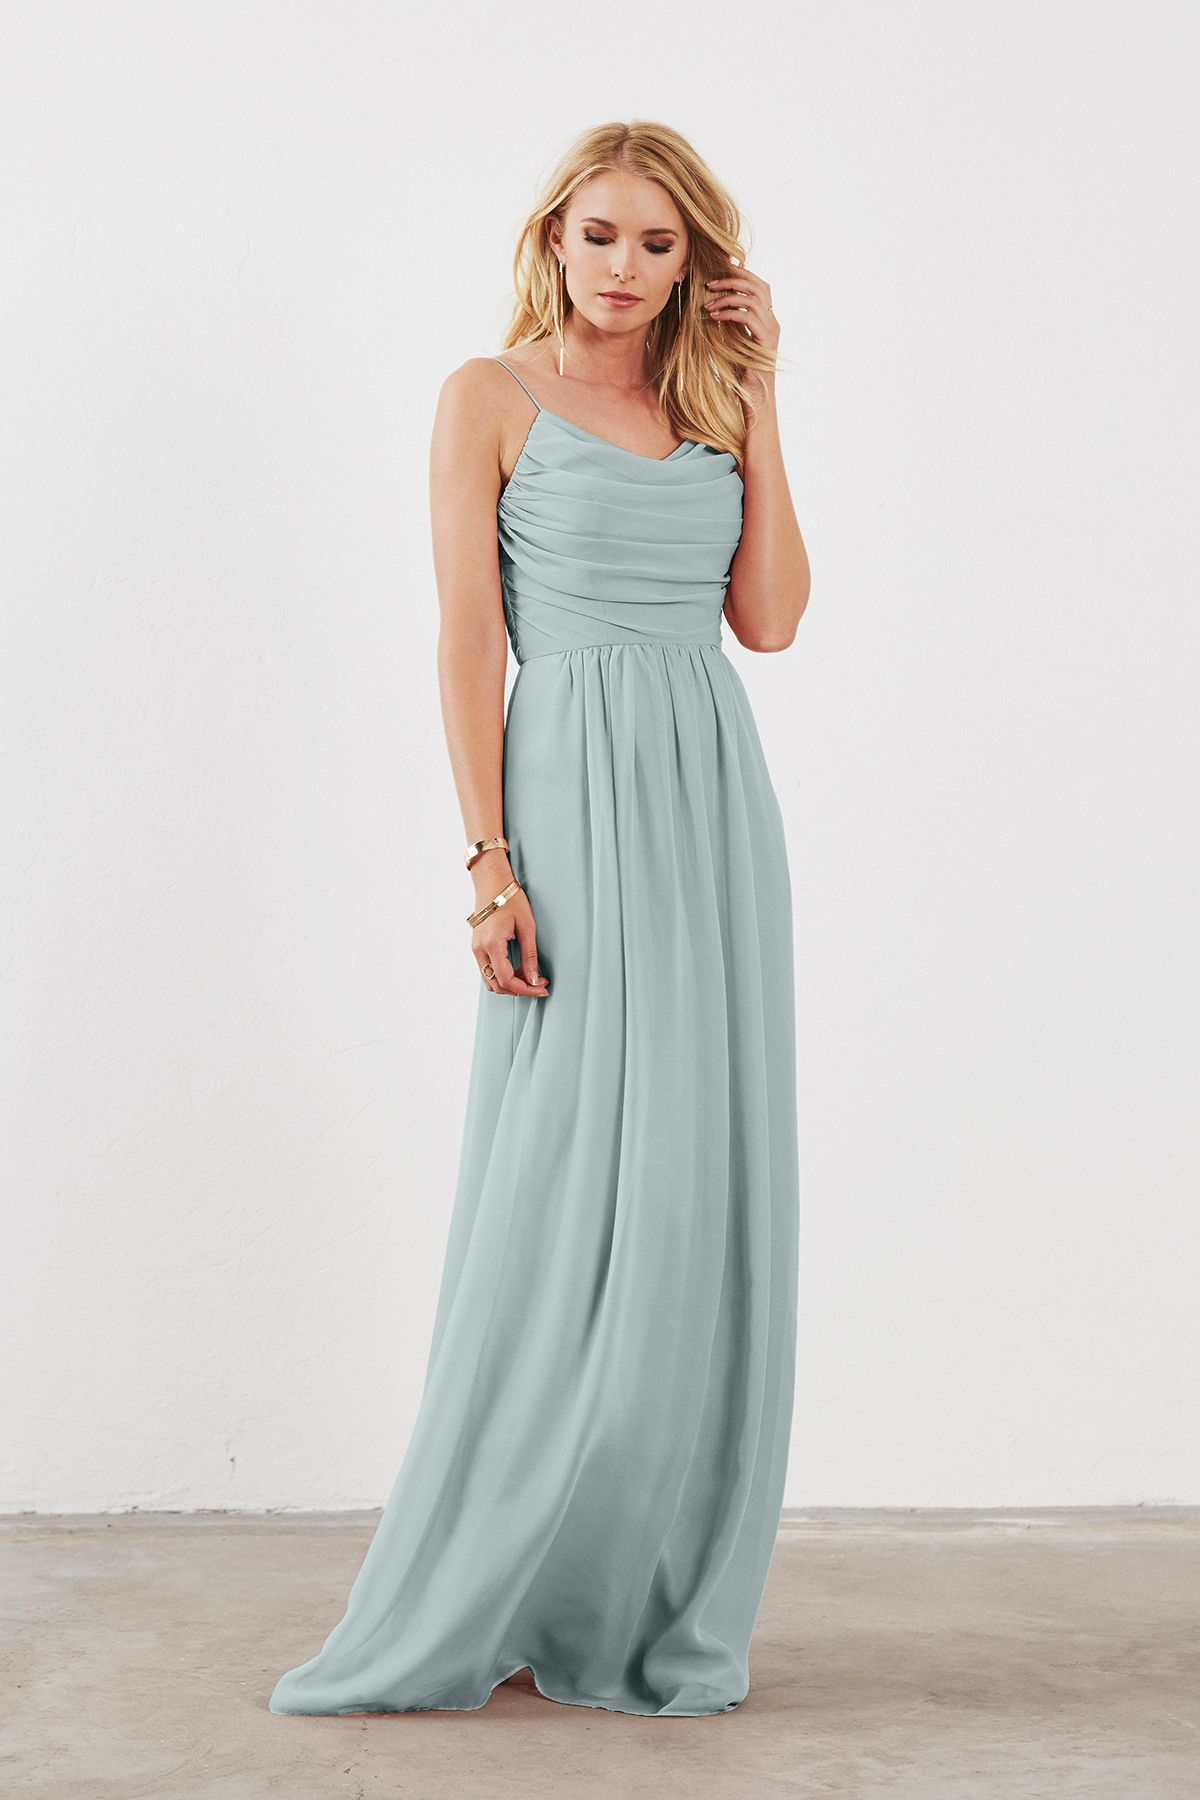 Lila | Favorite color, Bridal parties and Dahlia